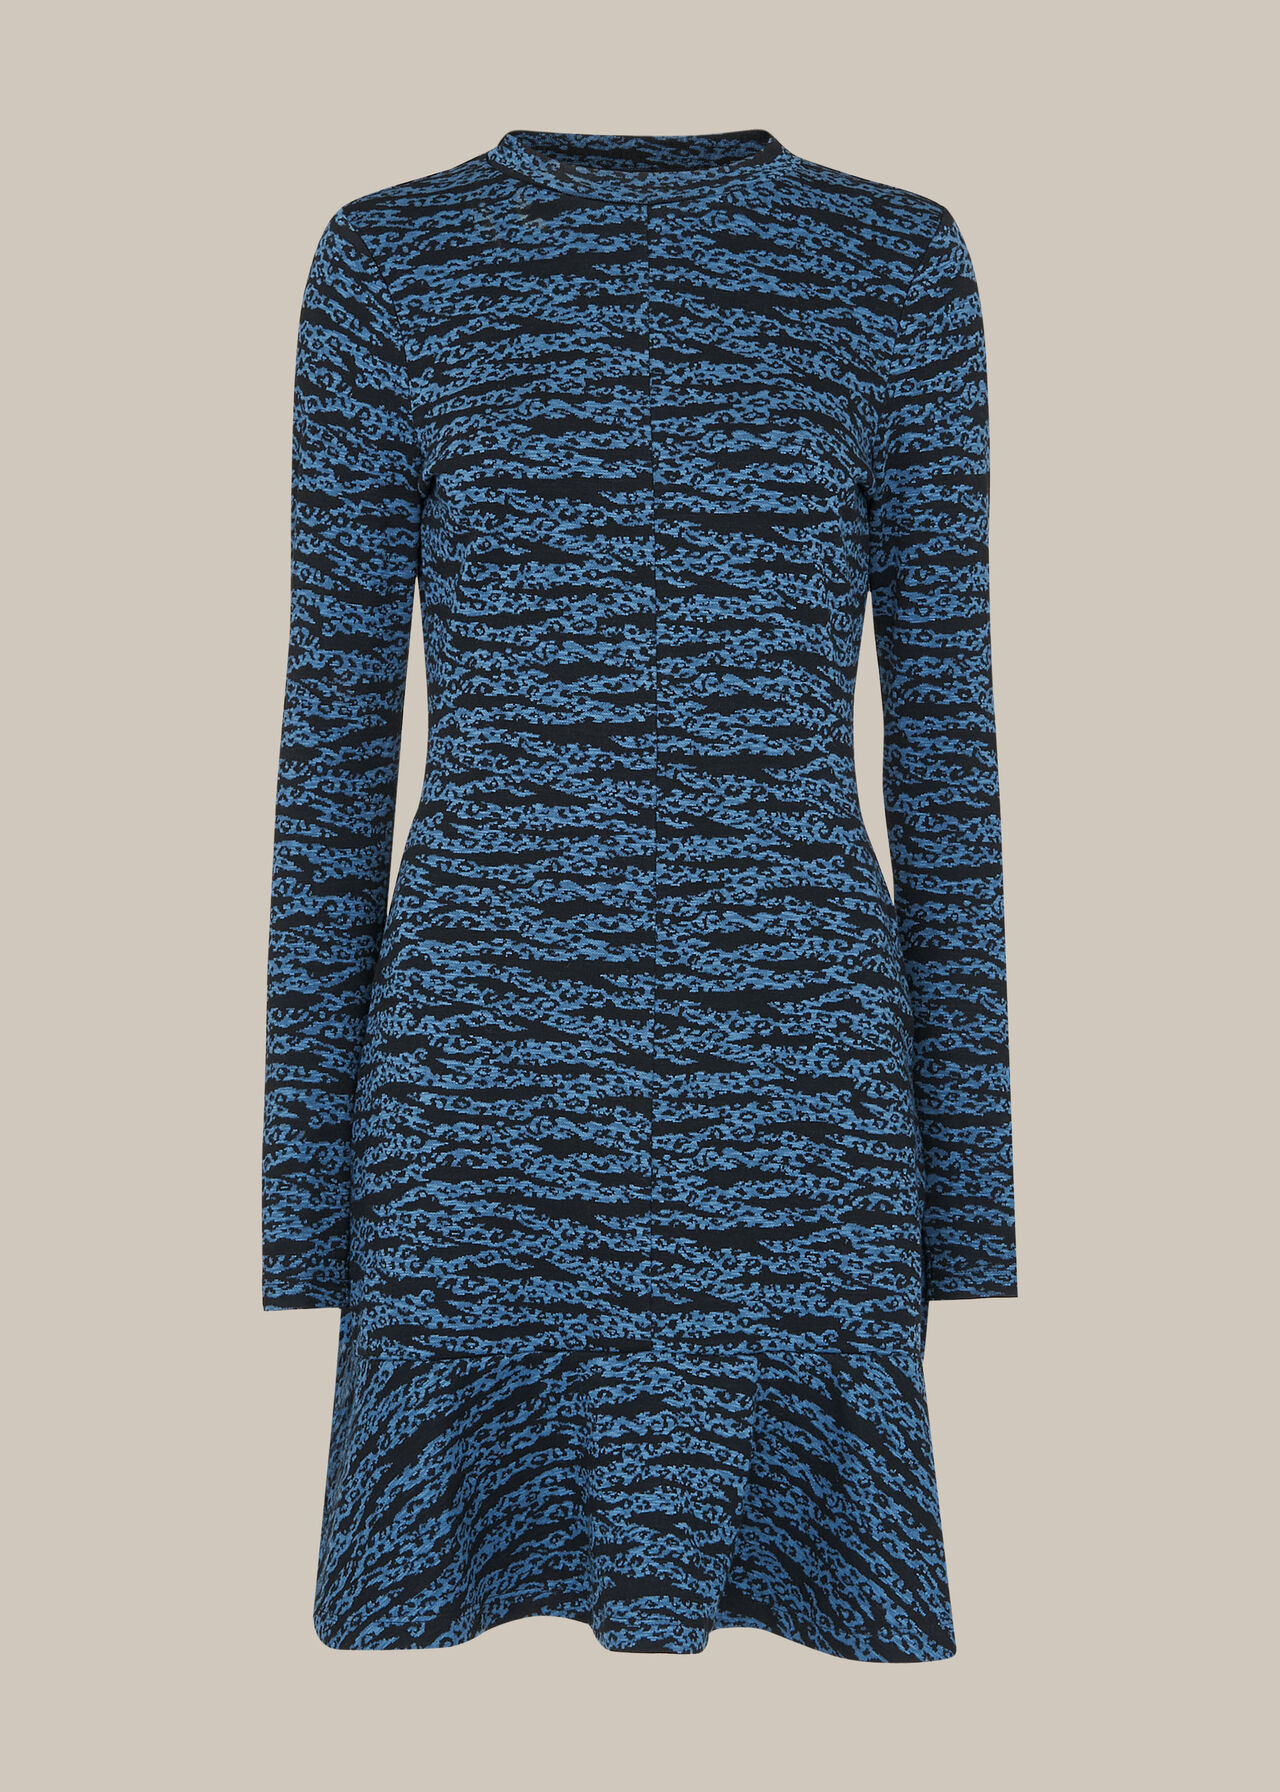 Tiger Leopard Flippy Dress